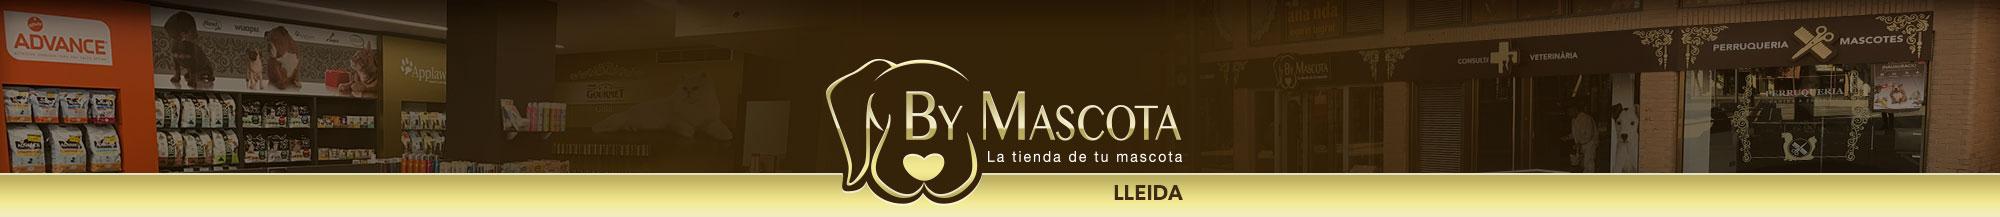 Tiendas Mascotas Lleida